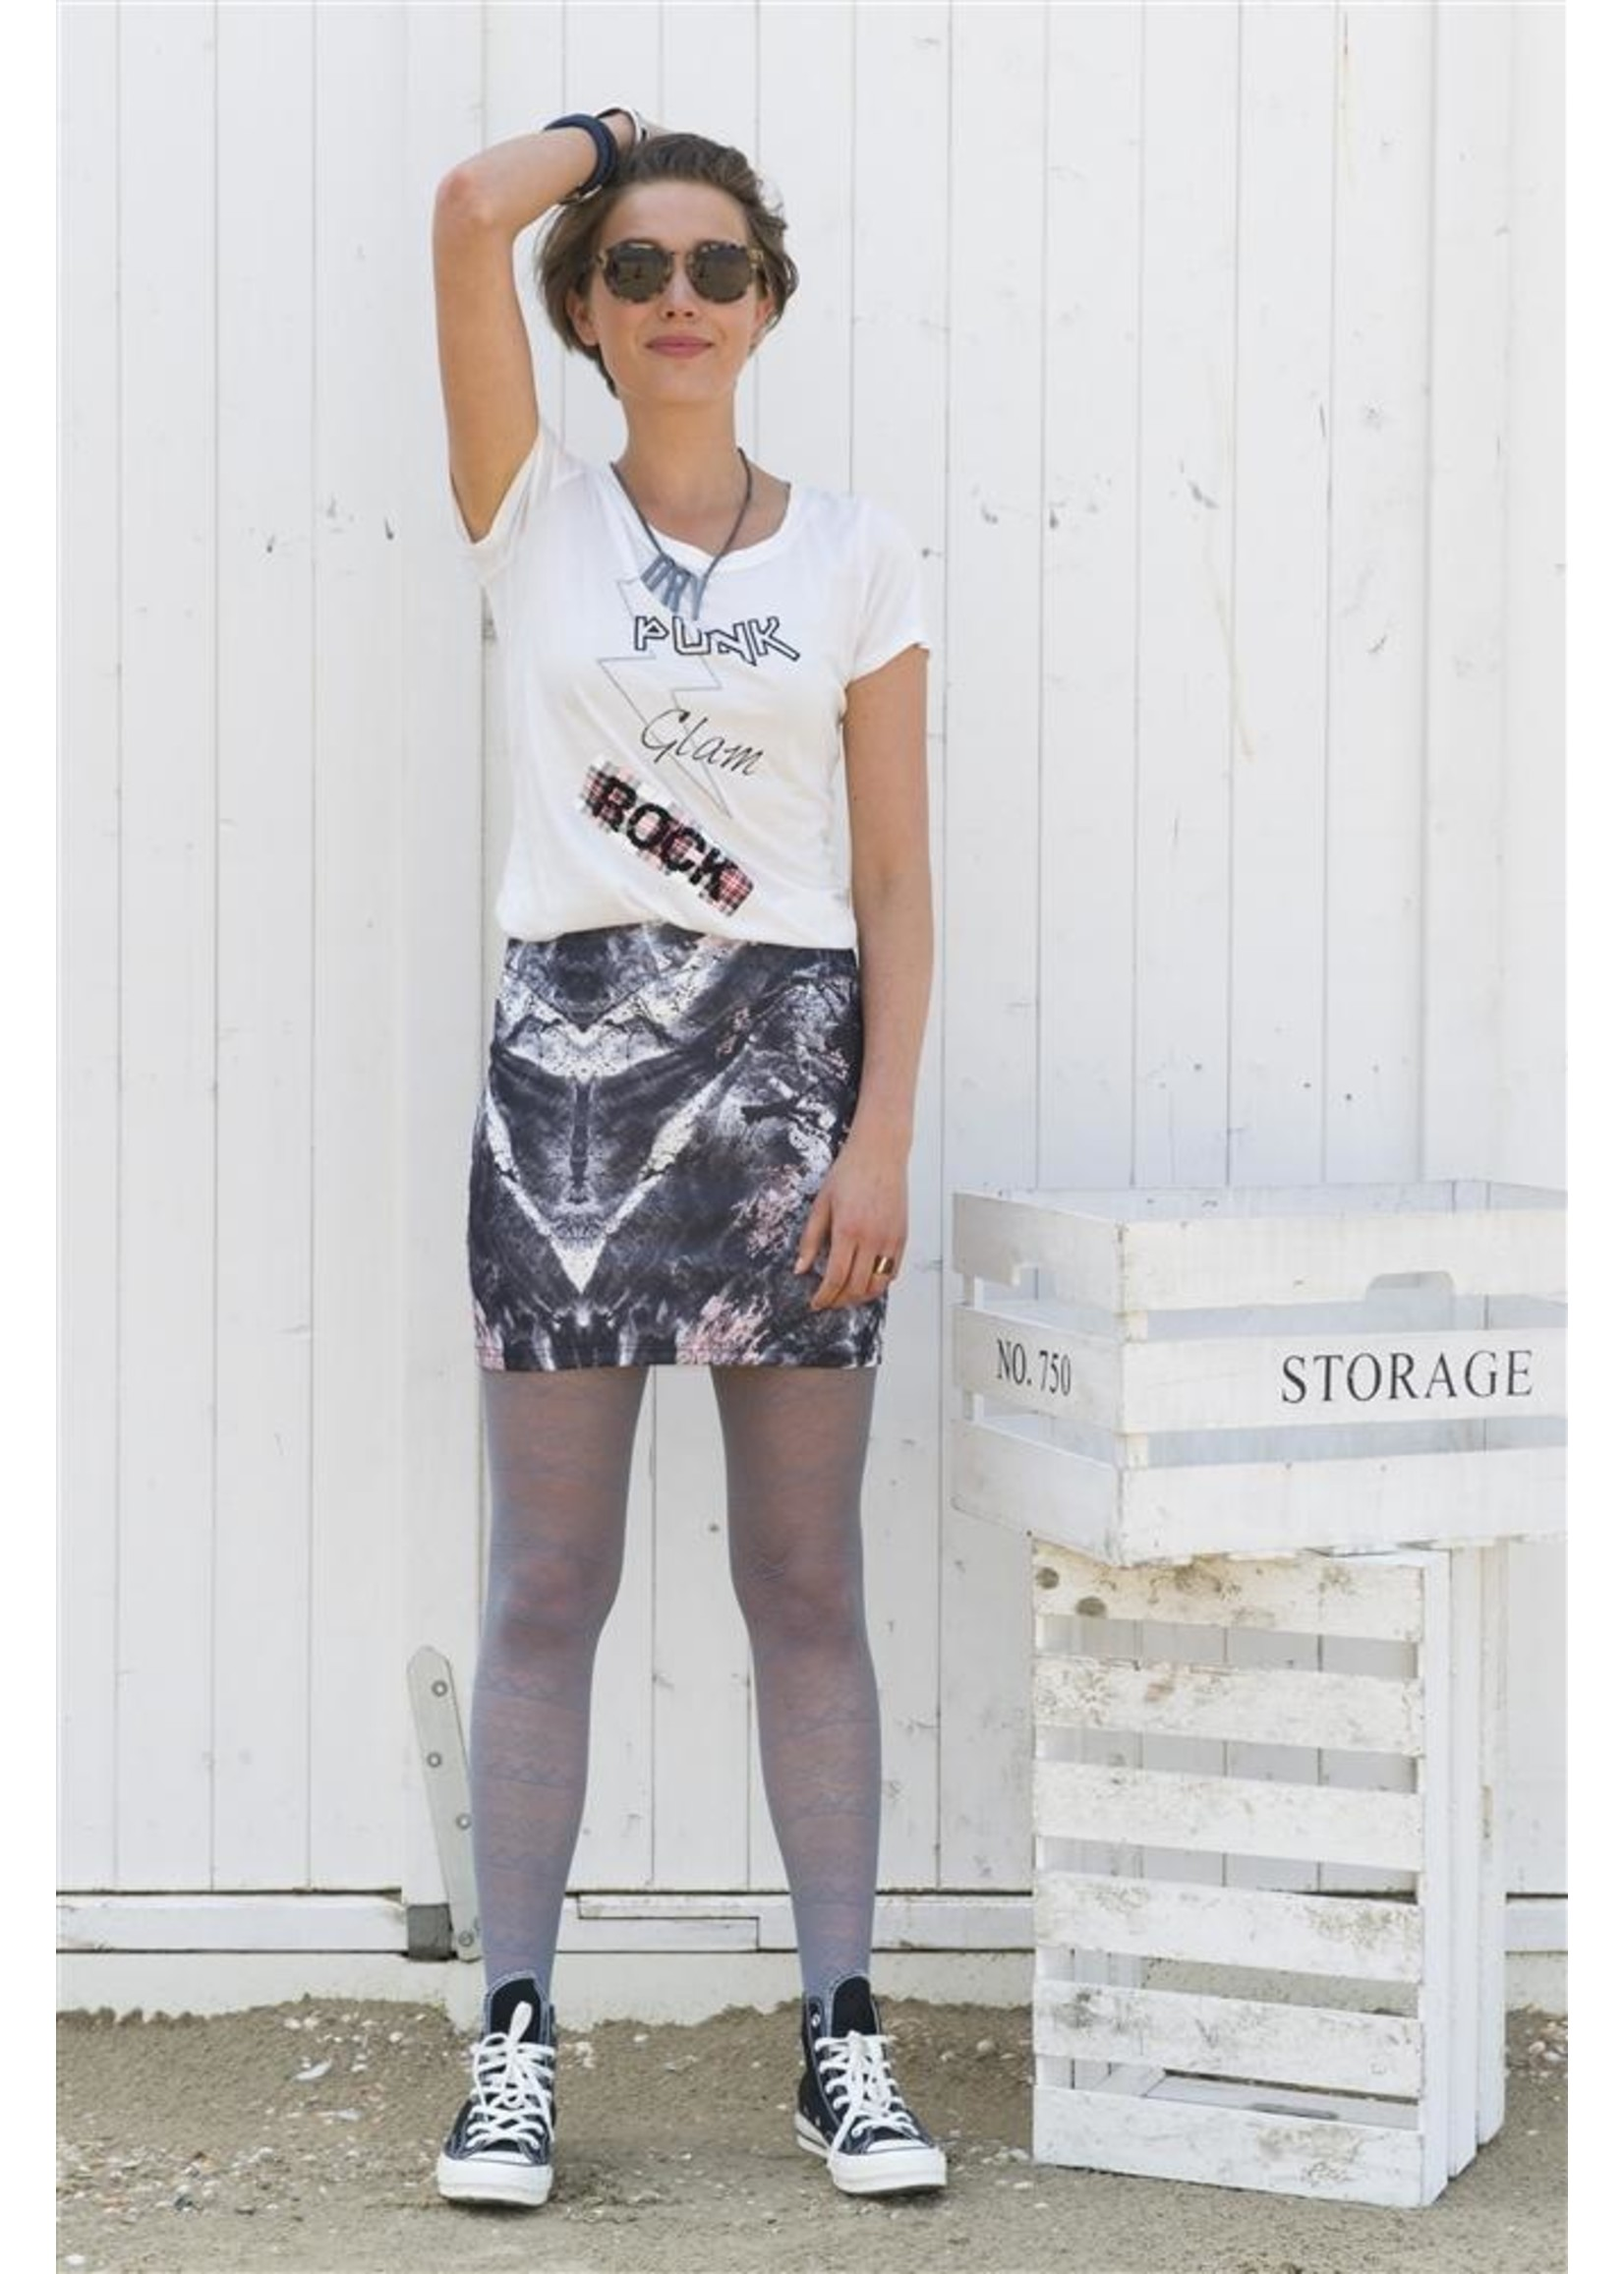 Bonnie Doon panty maat XL